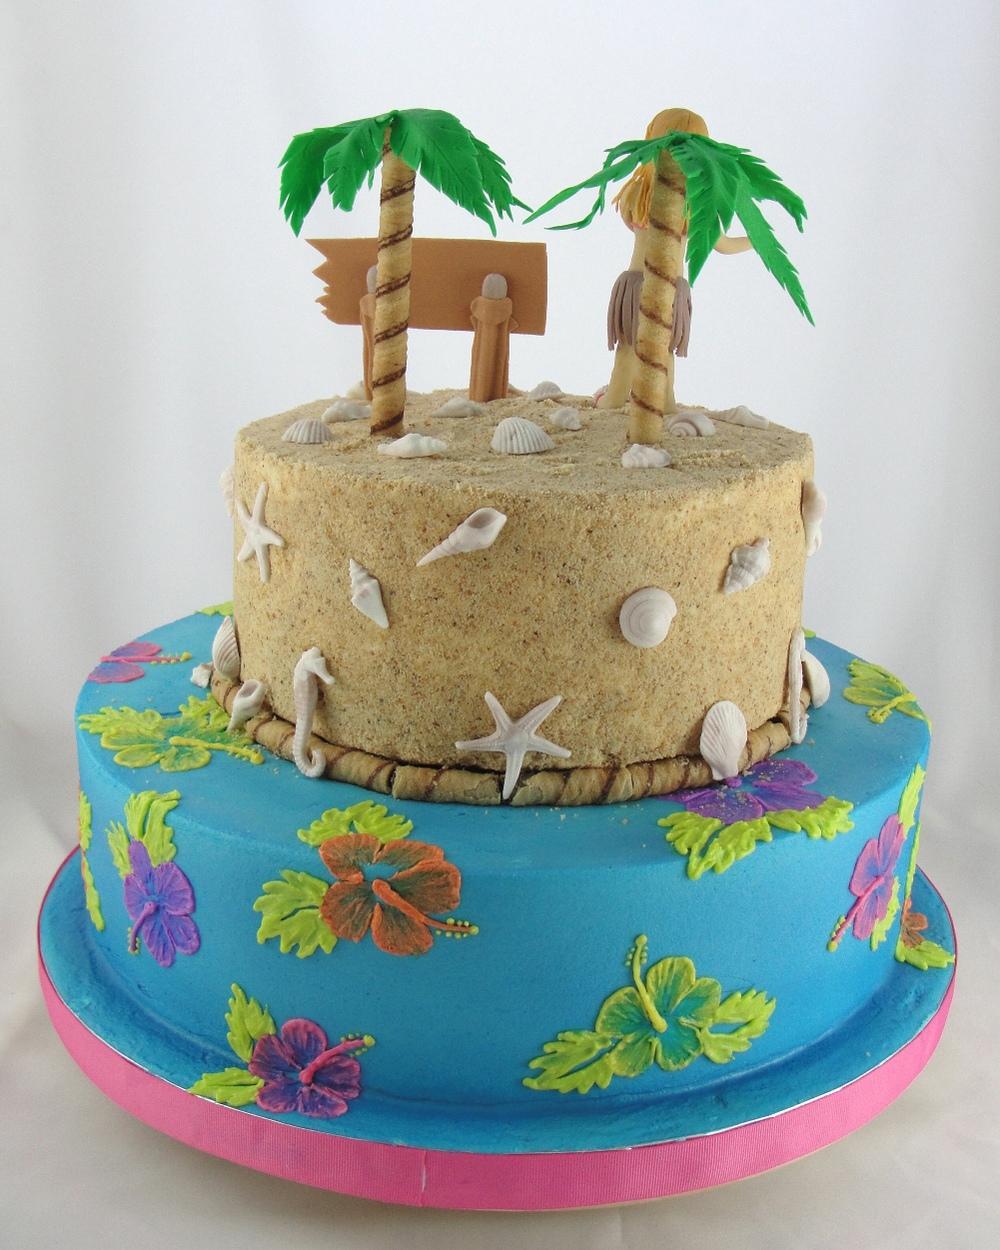 LBC 1321 - Hawaiian Luau Cake 3.jpg